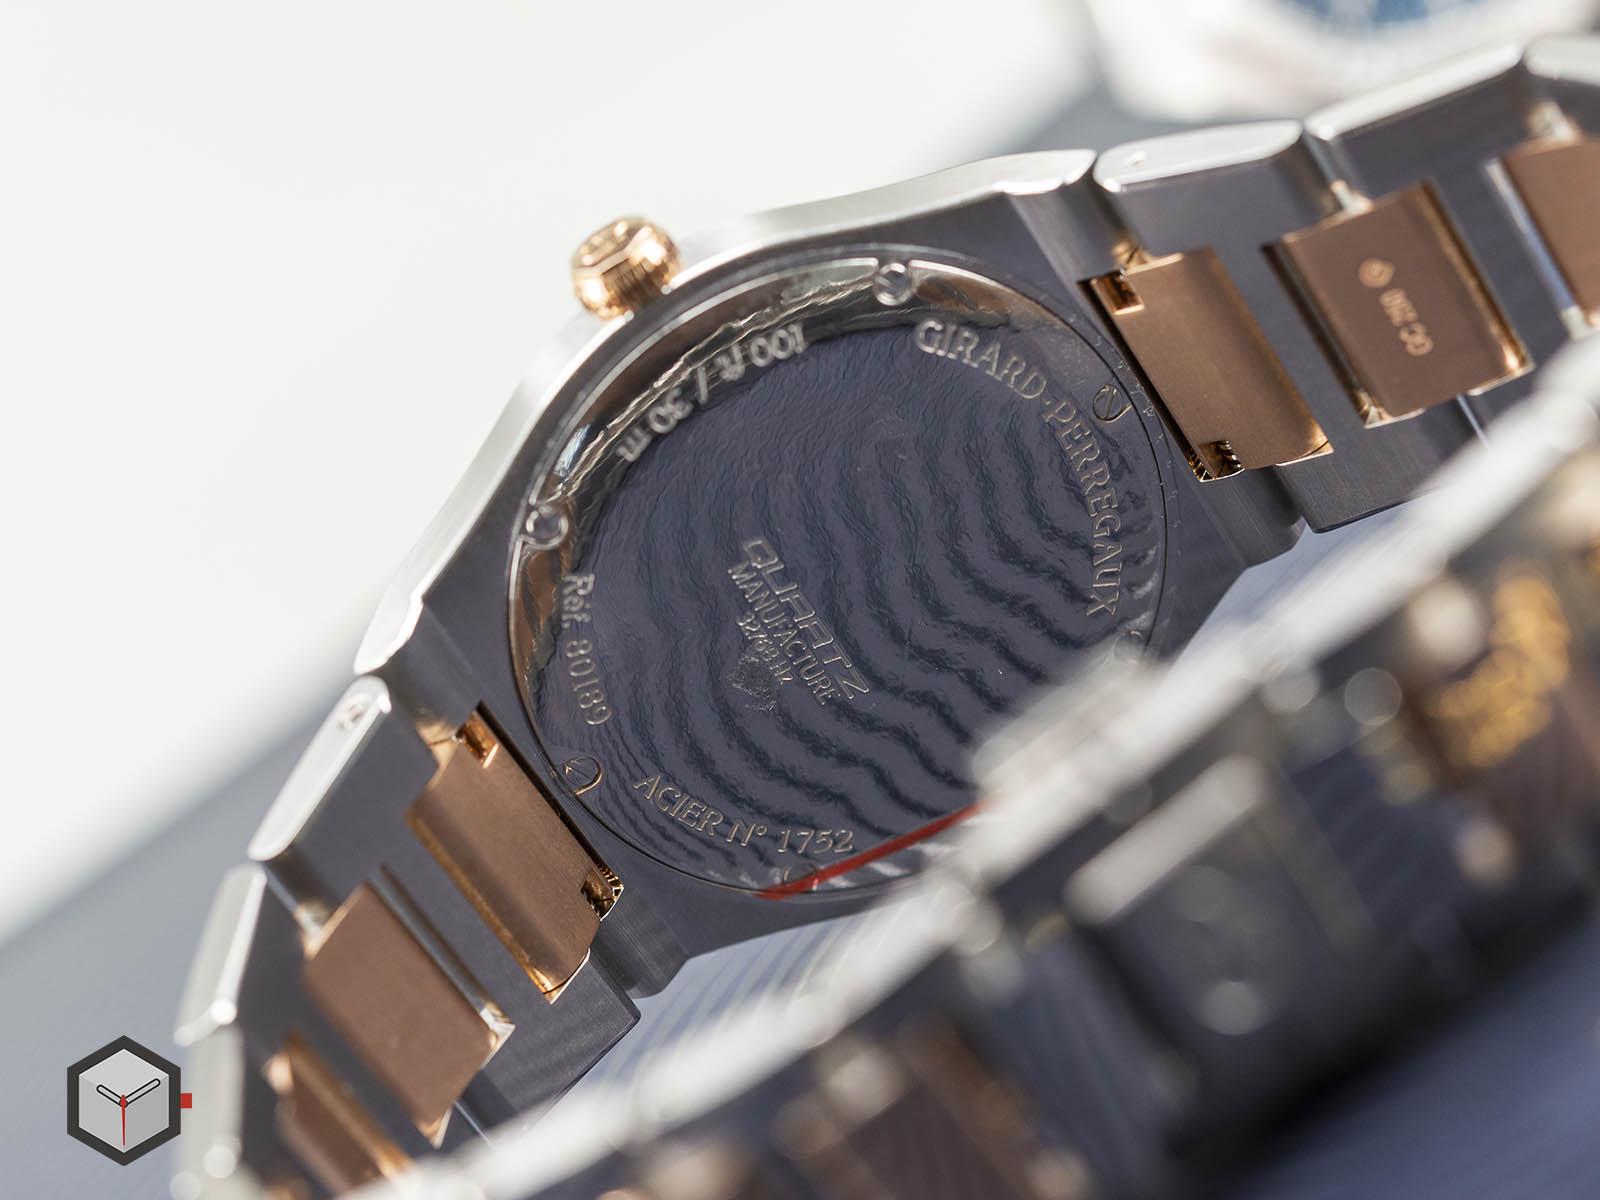 80189d56a331-56a-girard-perregaux-laureato-34-mm-6.jpg